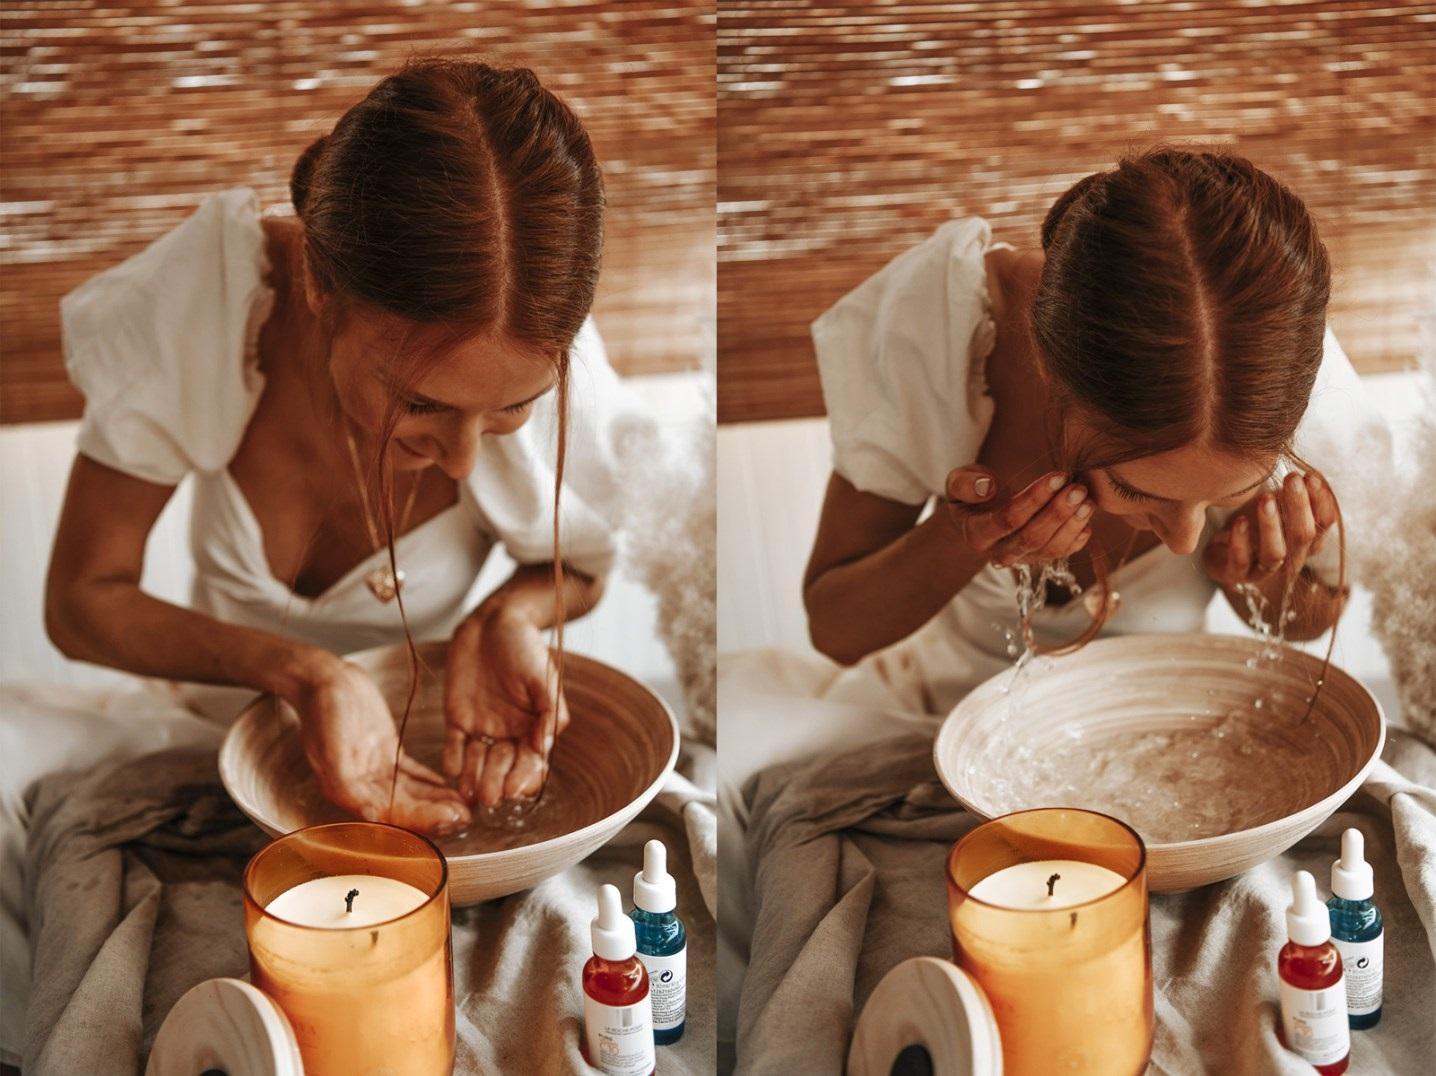 spray tan preparation by Anastasija thirtsty for tan